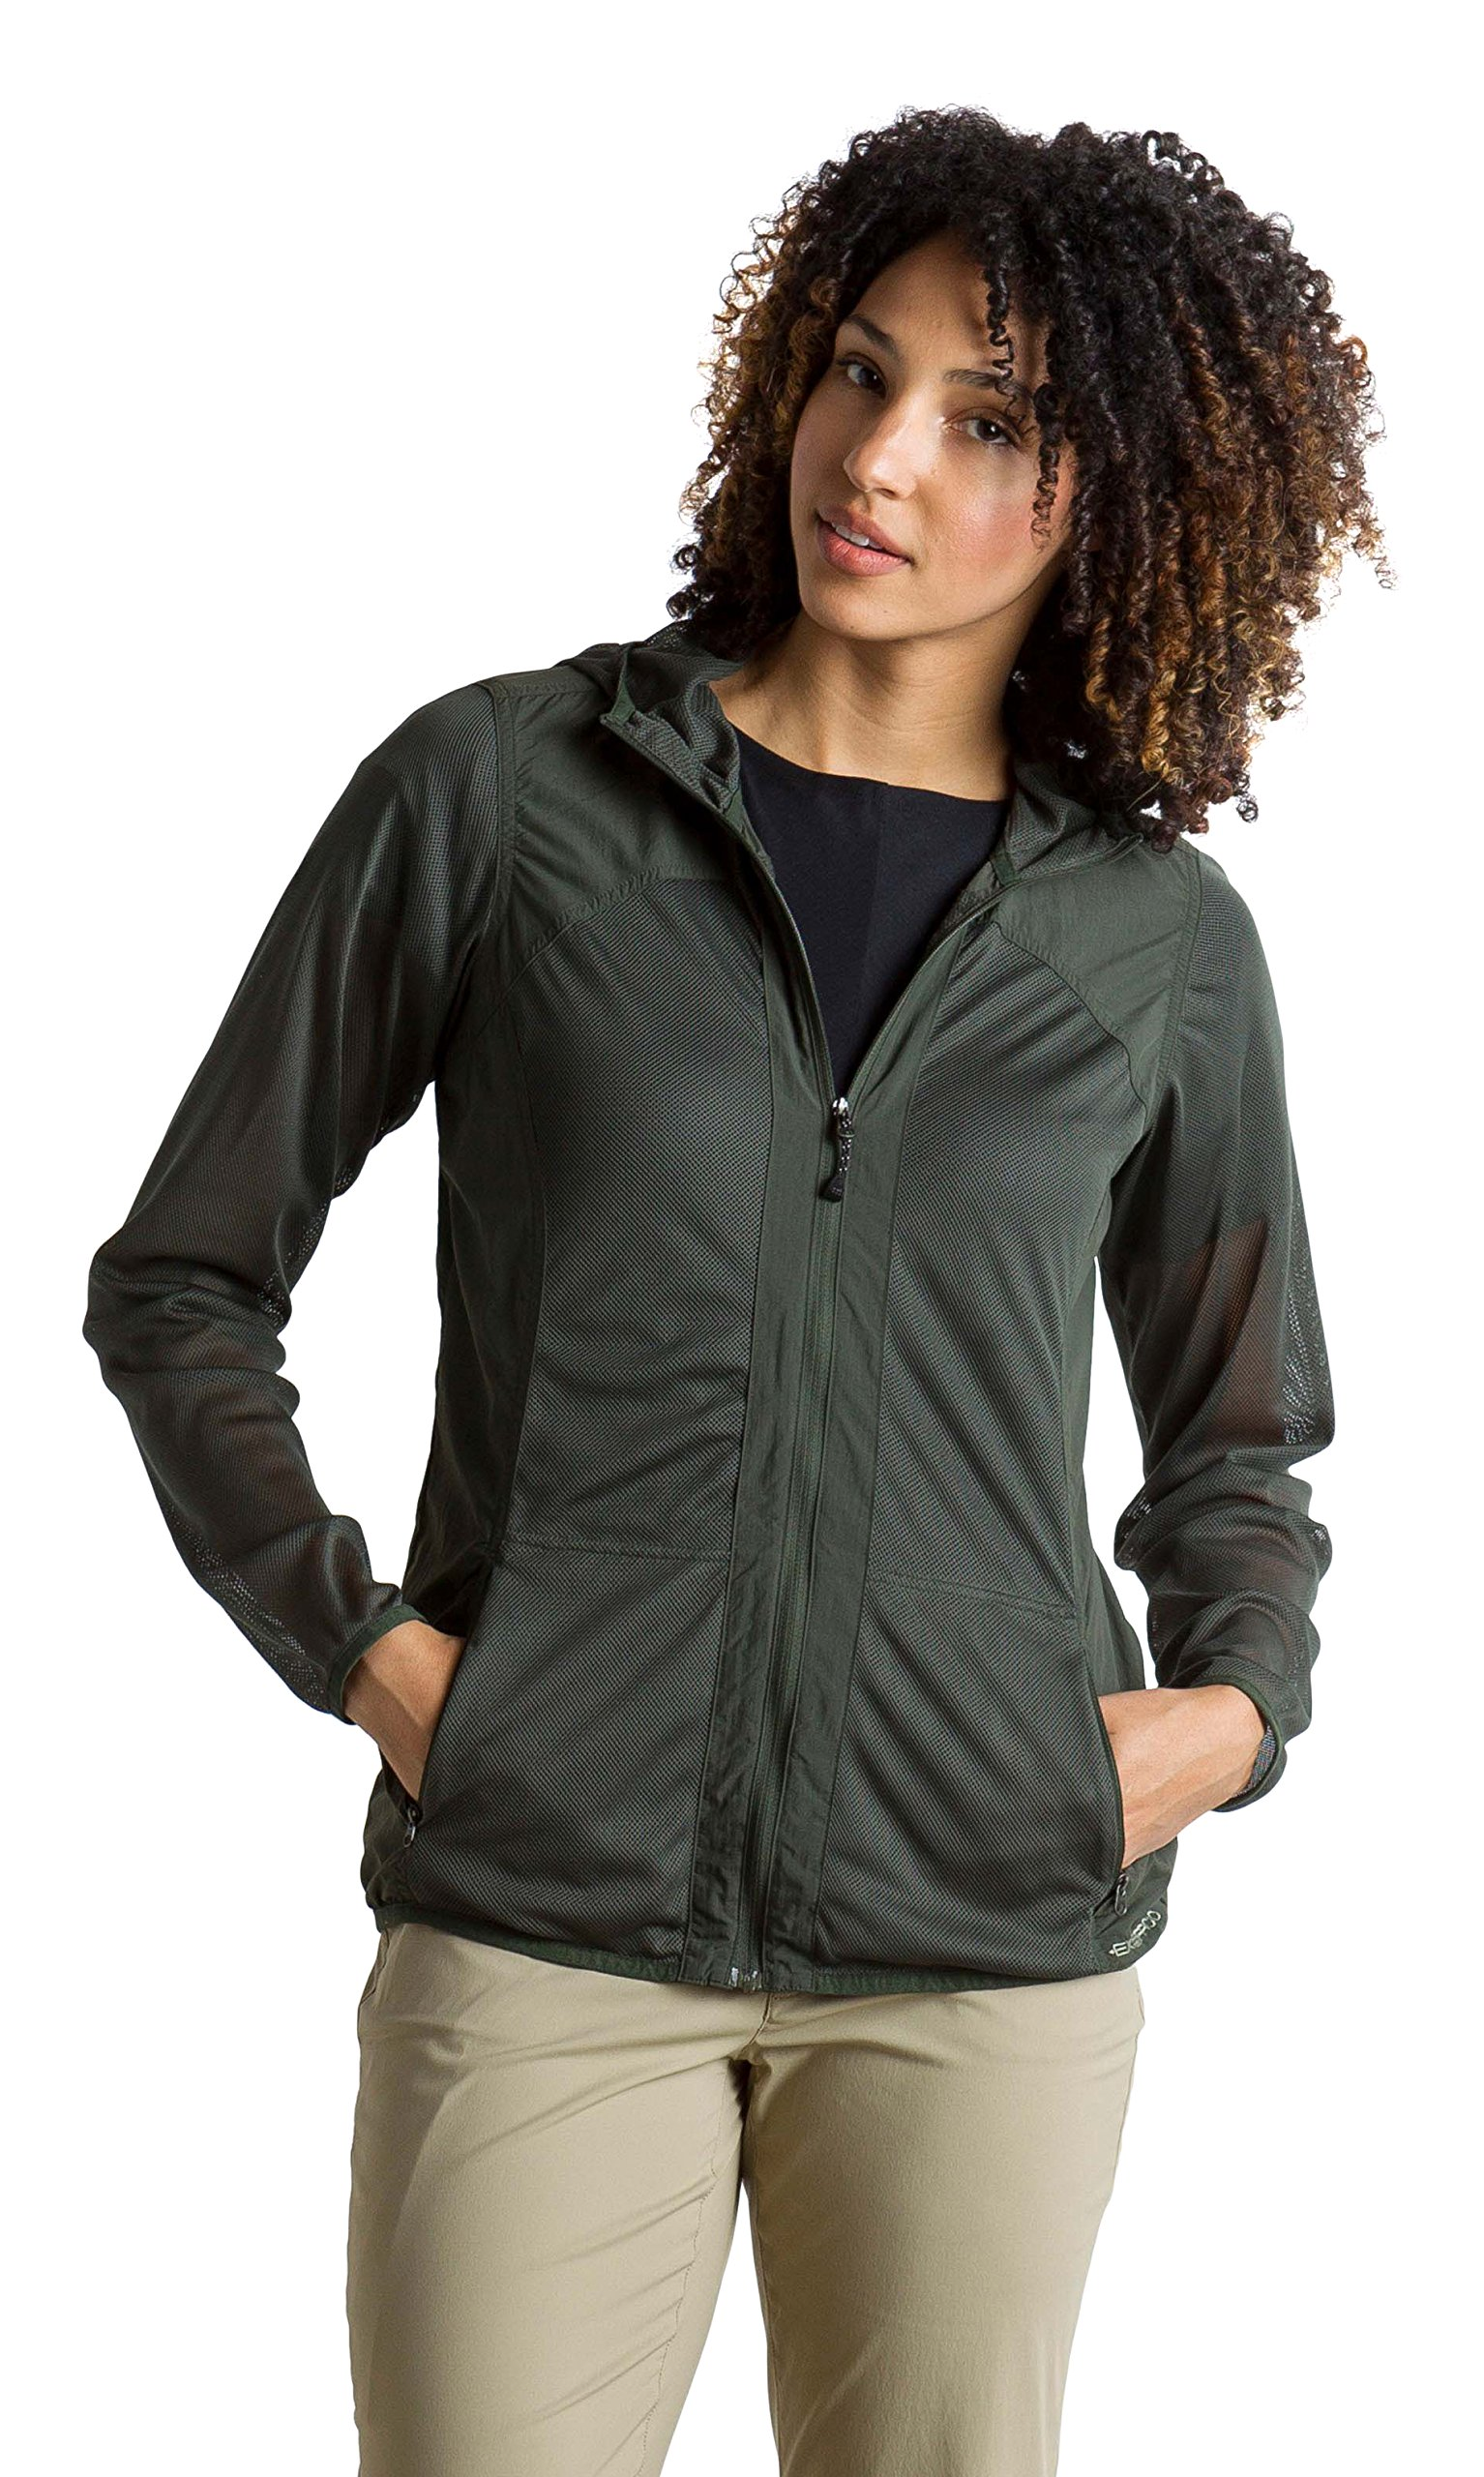 ExOfficio Women's BugsAway Damselfly Lightweight Hooded Jacket, Nordic, Medium